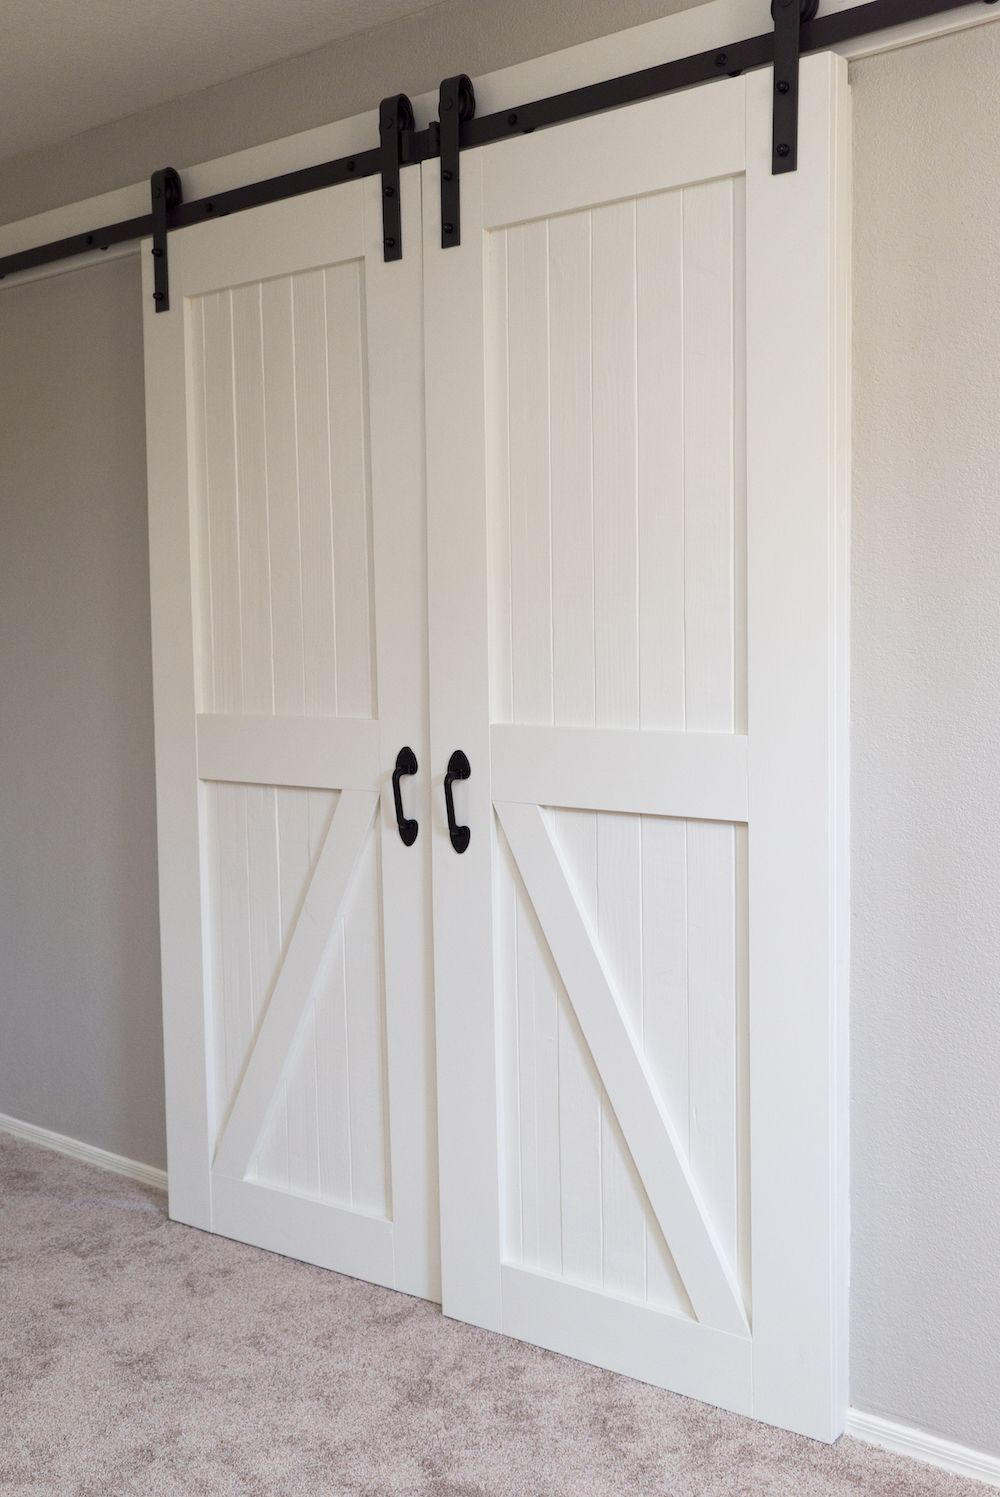 How To Build Barn Doors Diy Barn Doors Step By Step